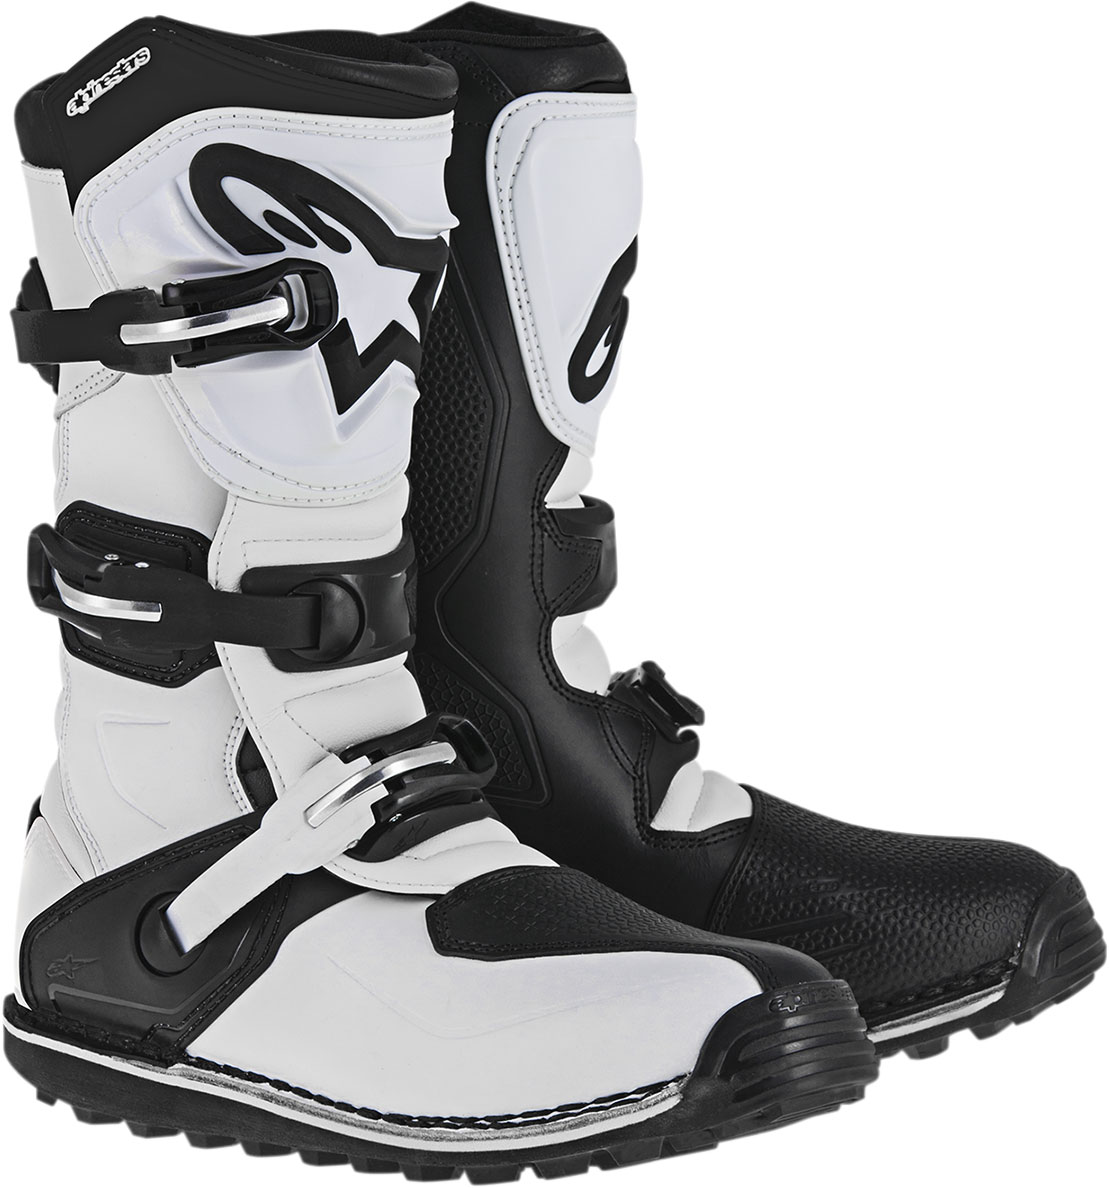 Alpinestars Trials Offroad TECH-T Boots (White/Black)